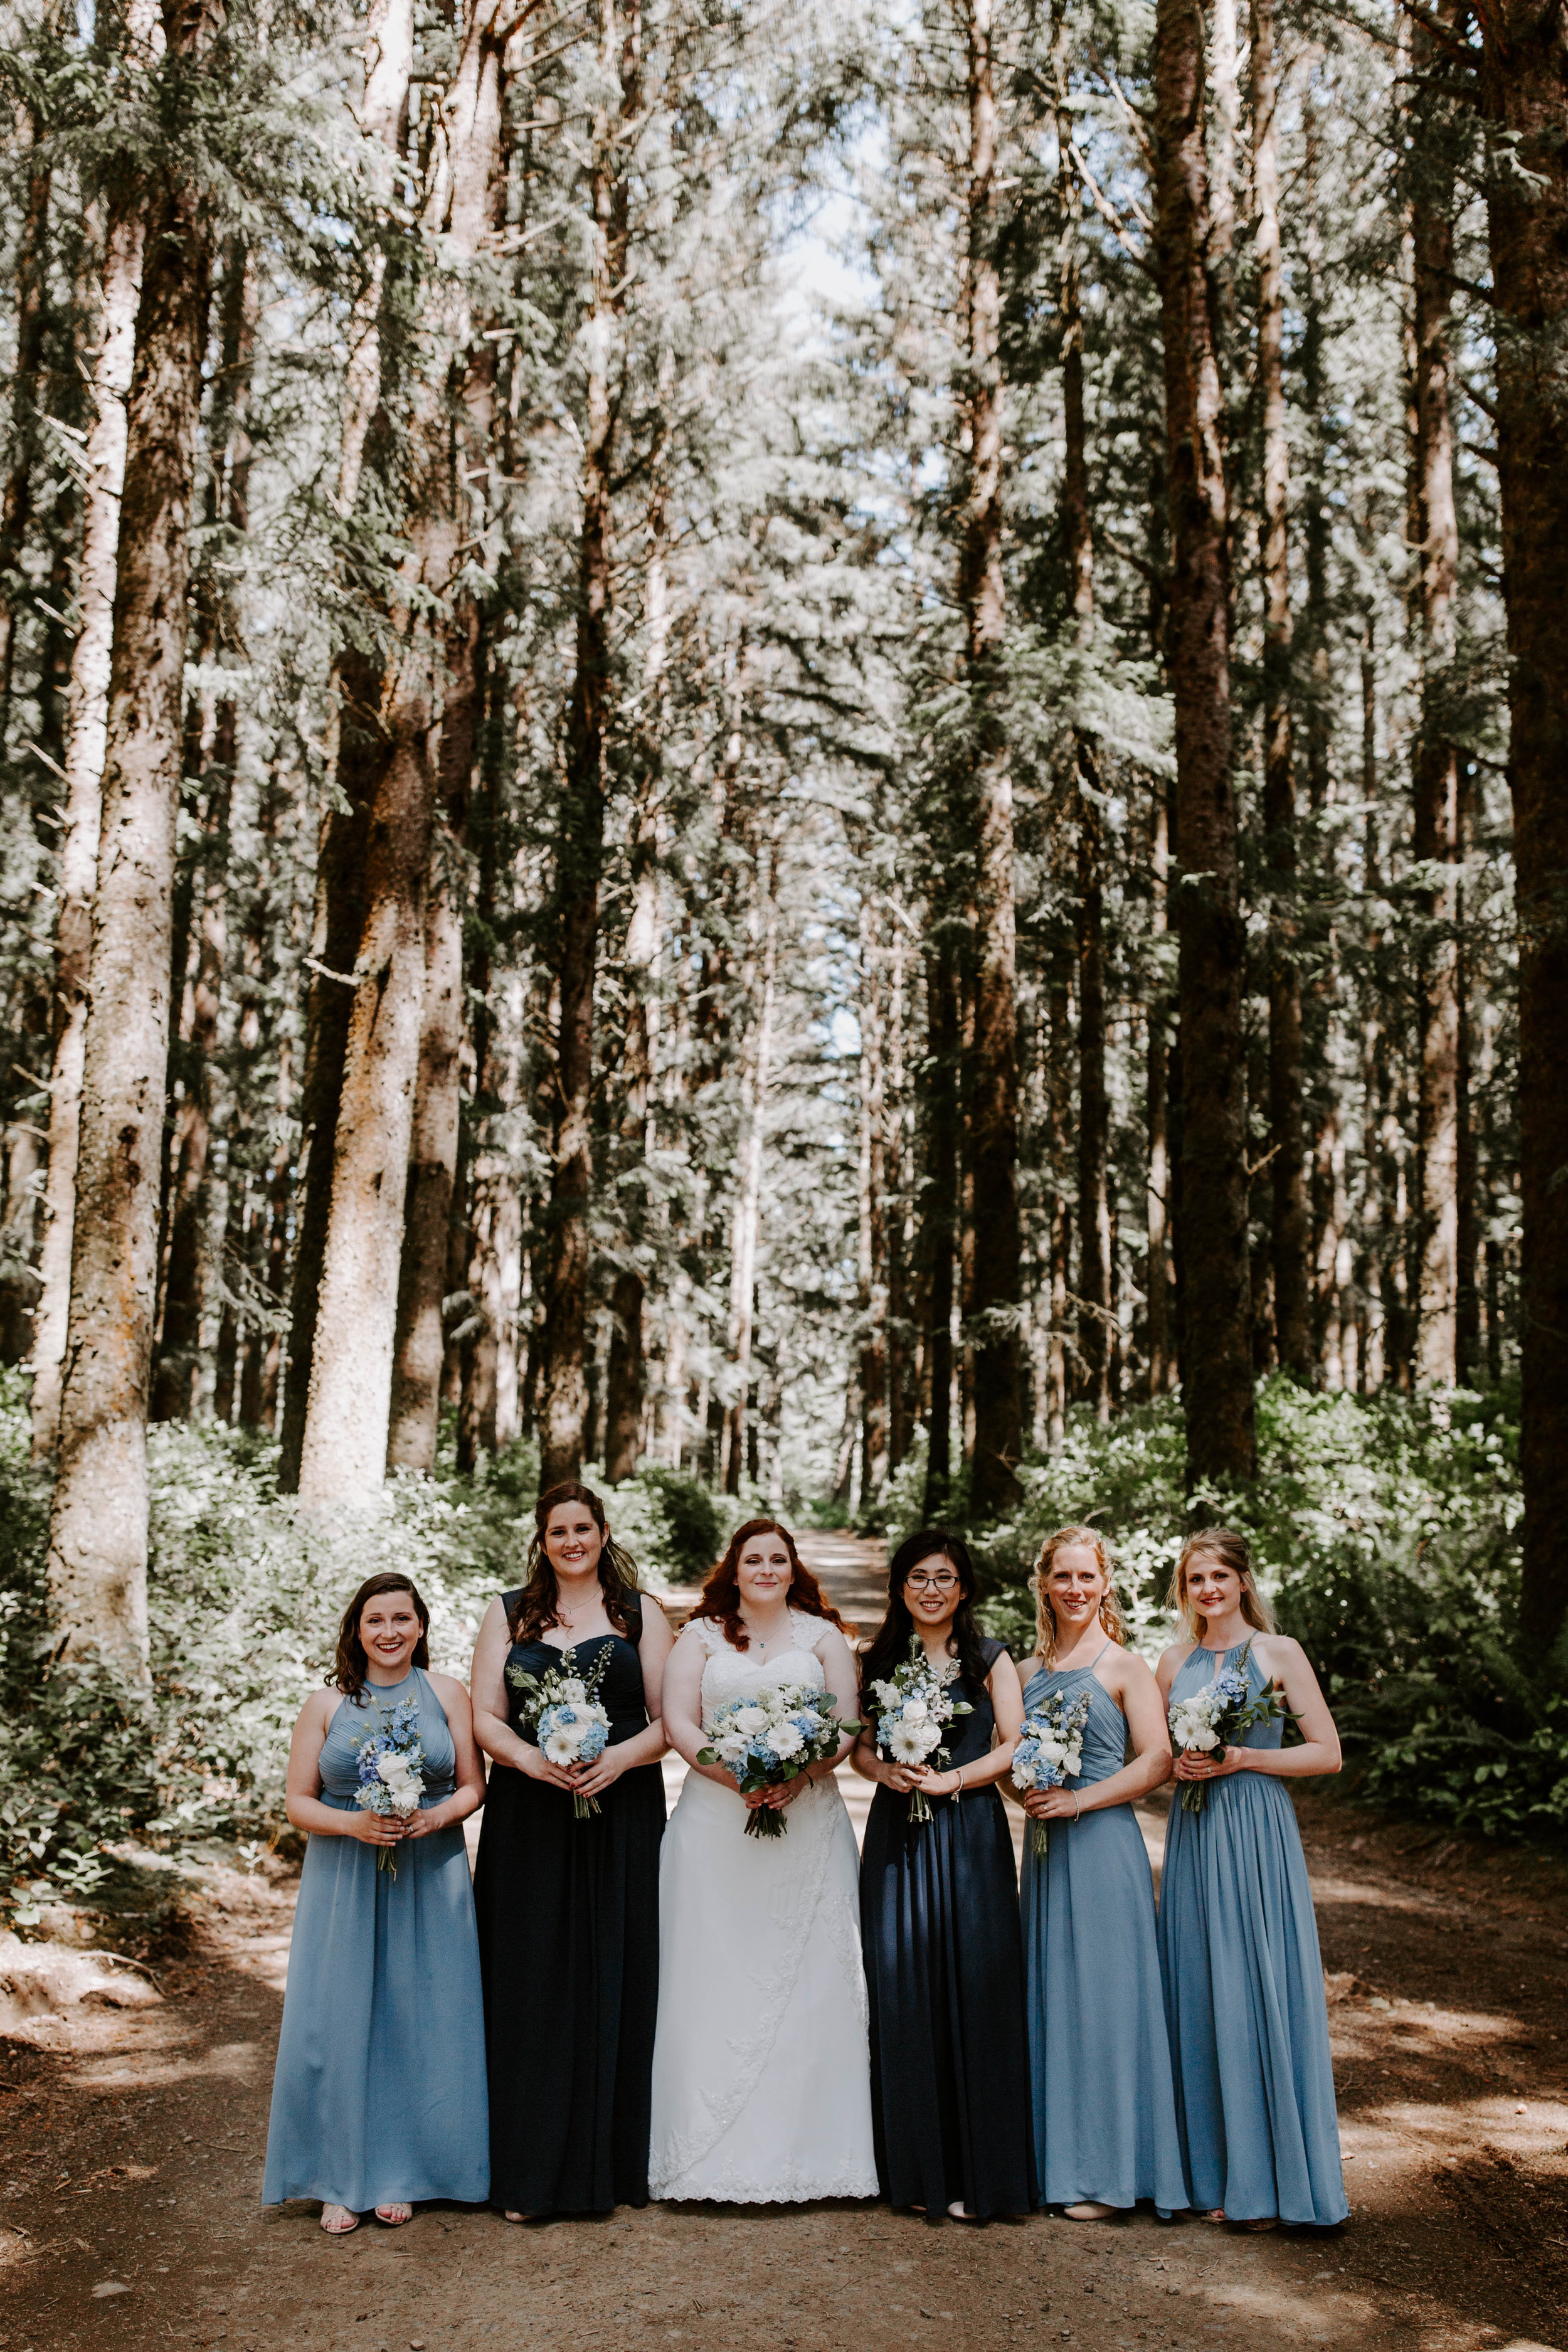 Oregon Wedding Photographer | Wedding in the Woods | Rustic Bloom Photography